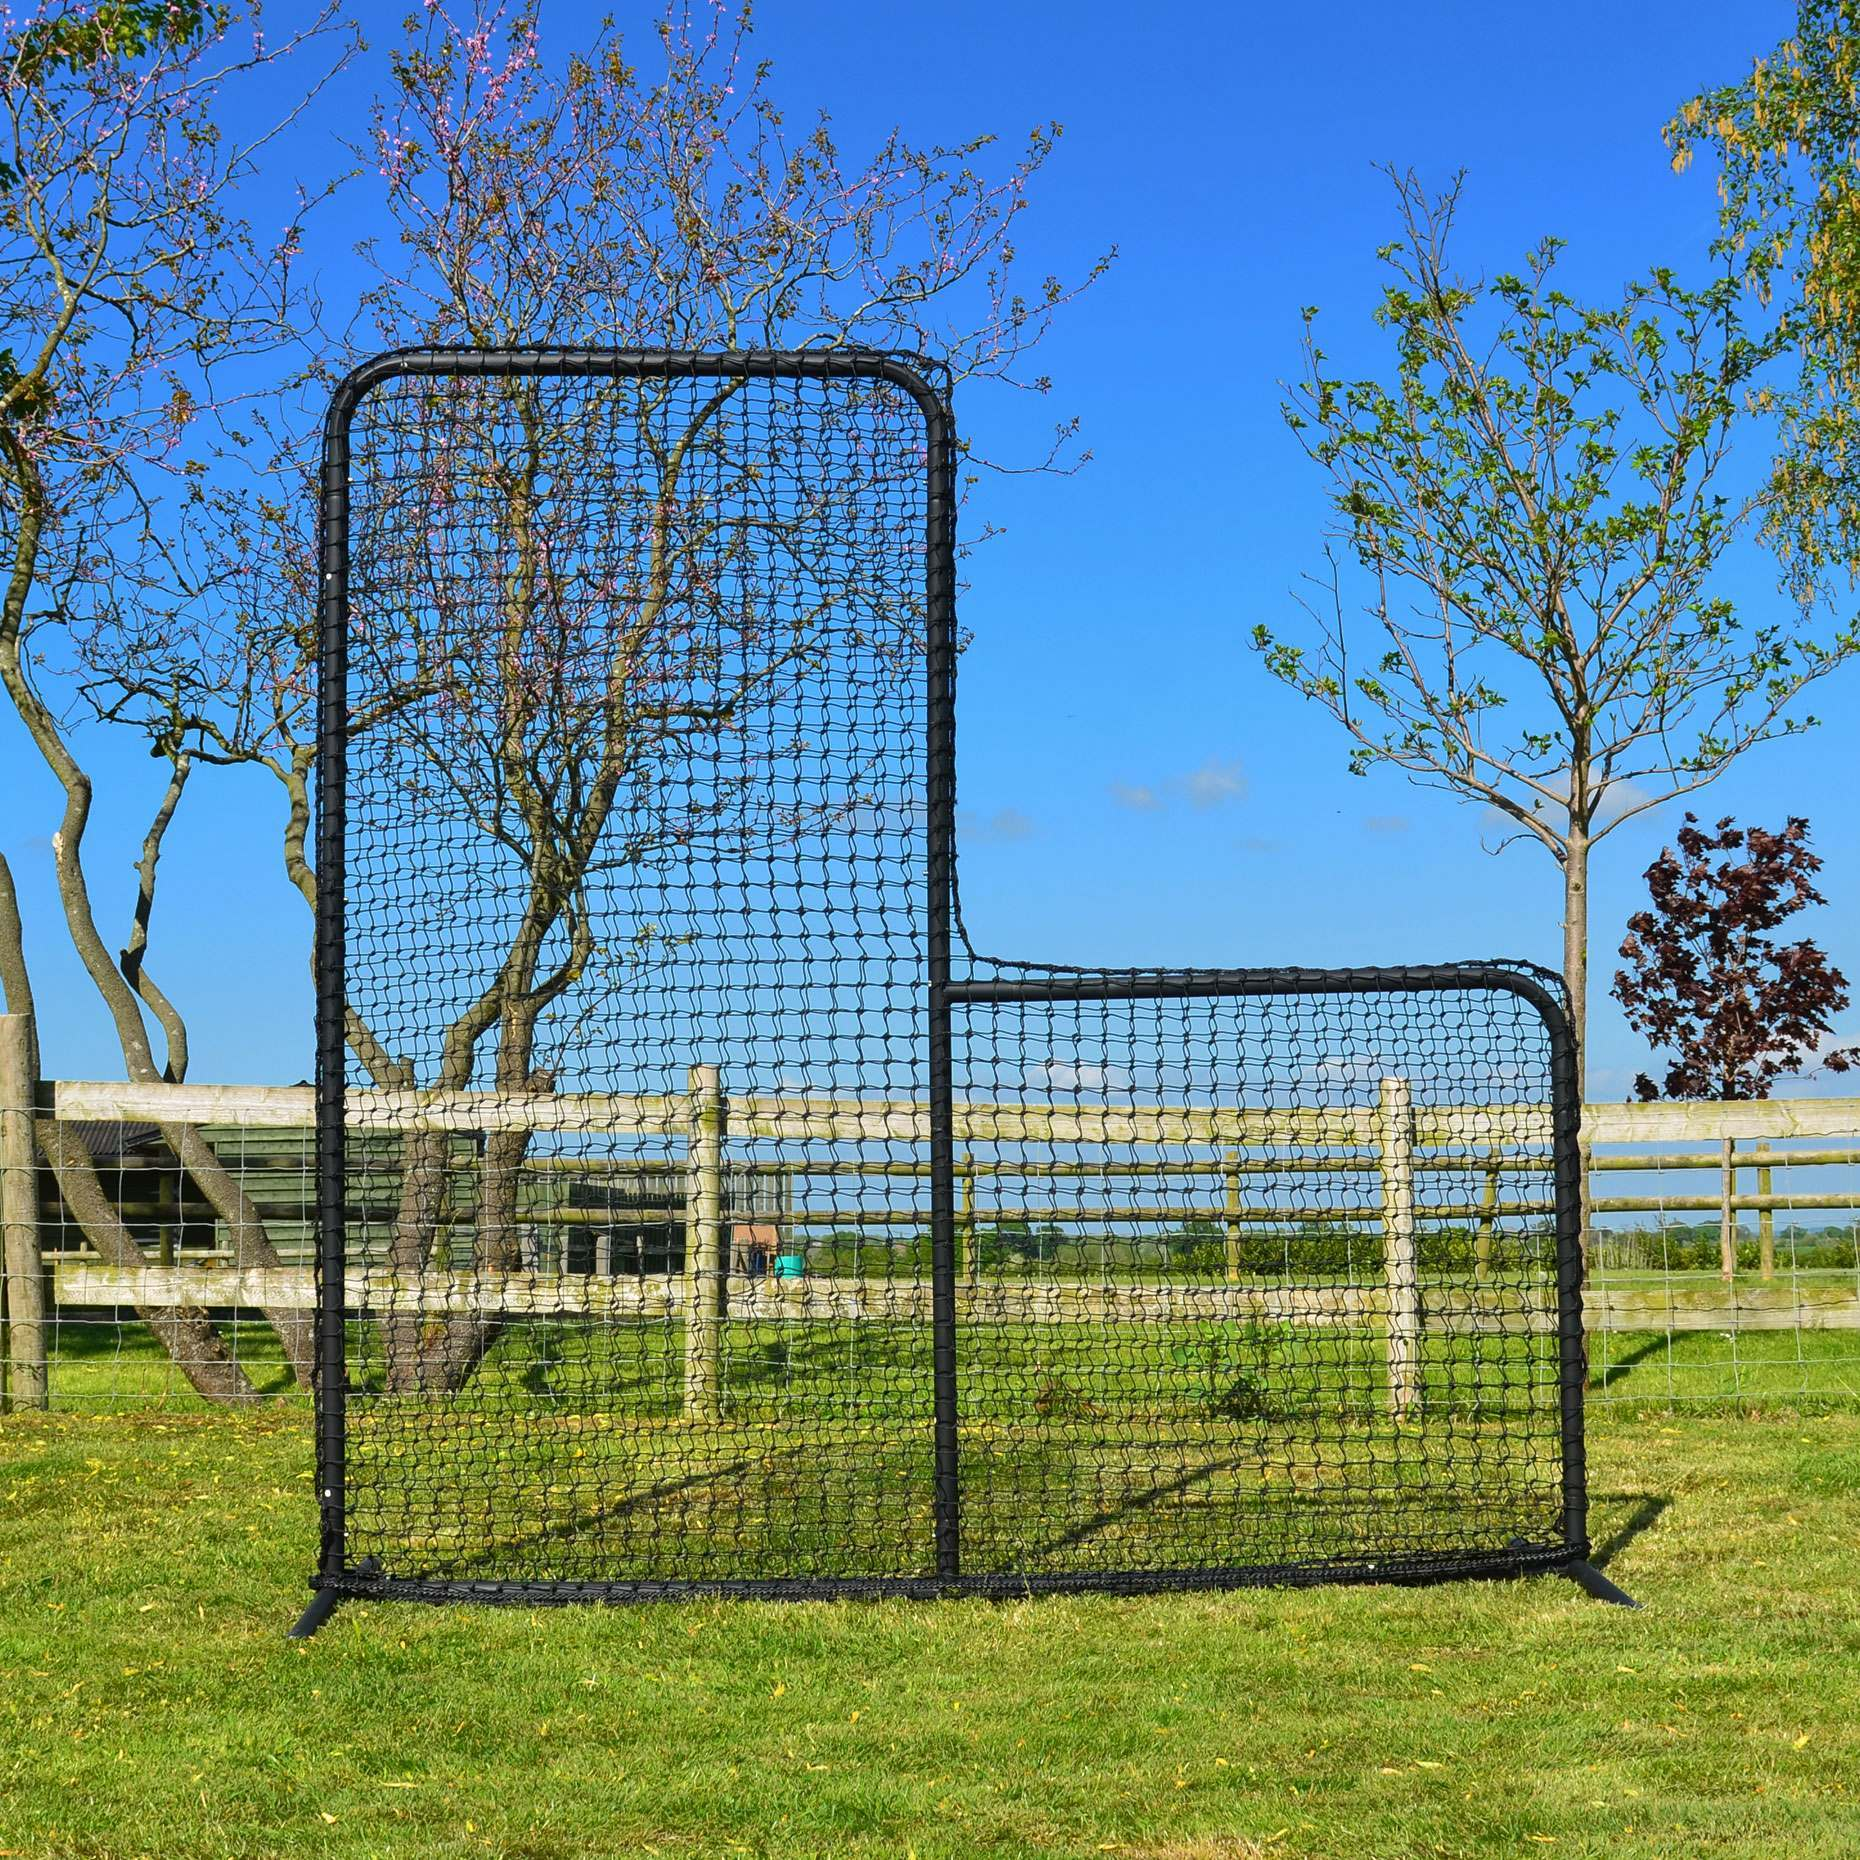 7' x 7' Cricket Throw-Down Protector Screen